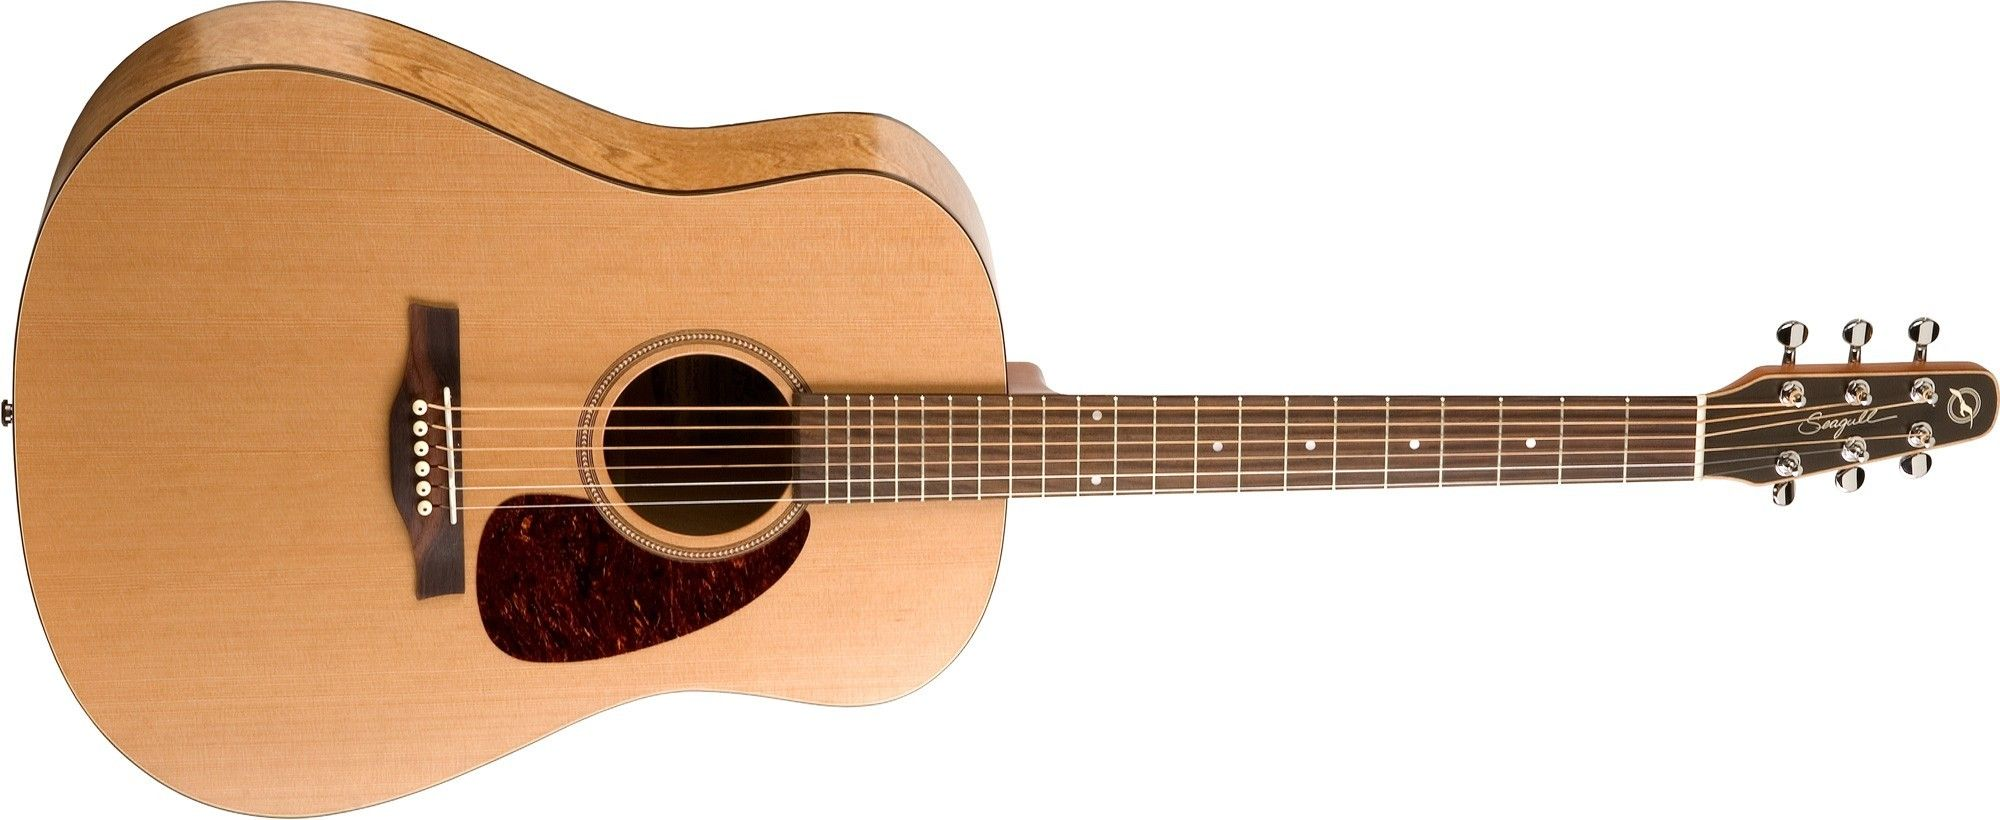 Pin On Acoustic Guitar Ukelele Teach Yourself Guitar